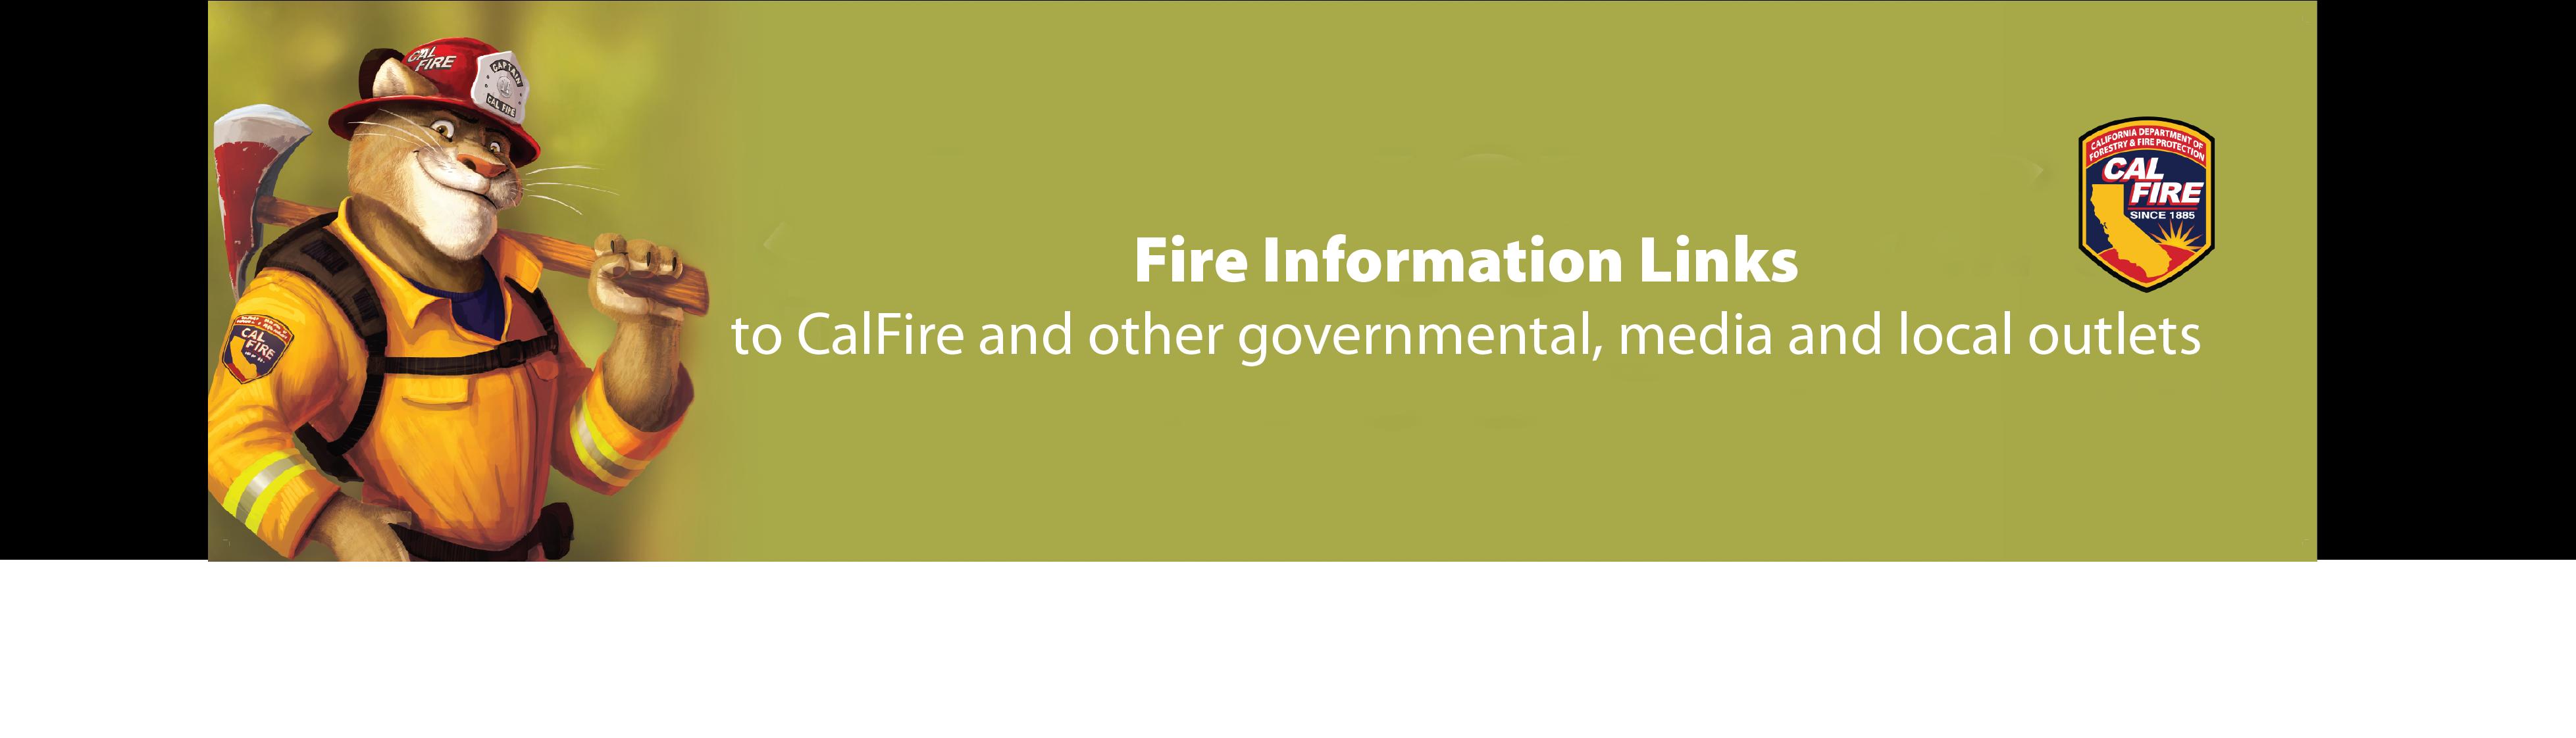 Fire Info Links 2020